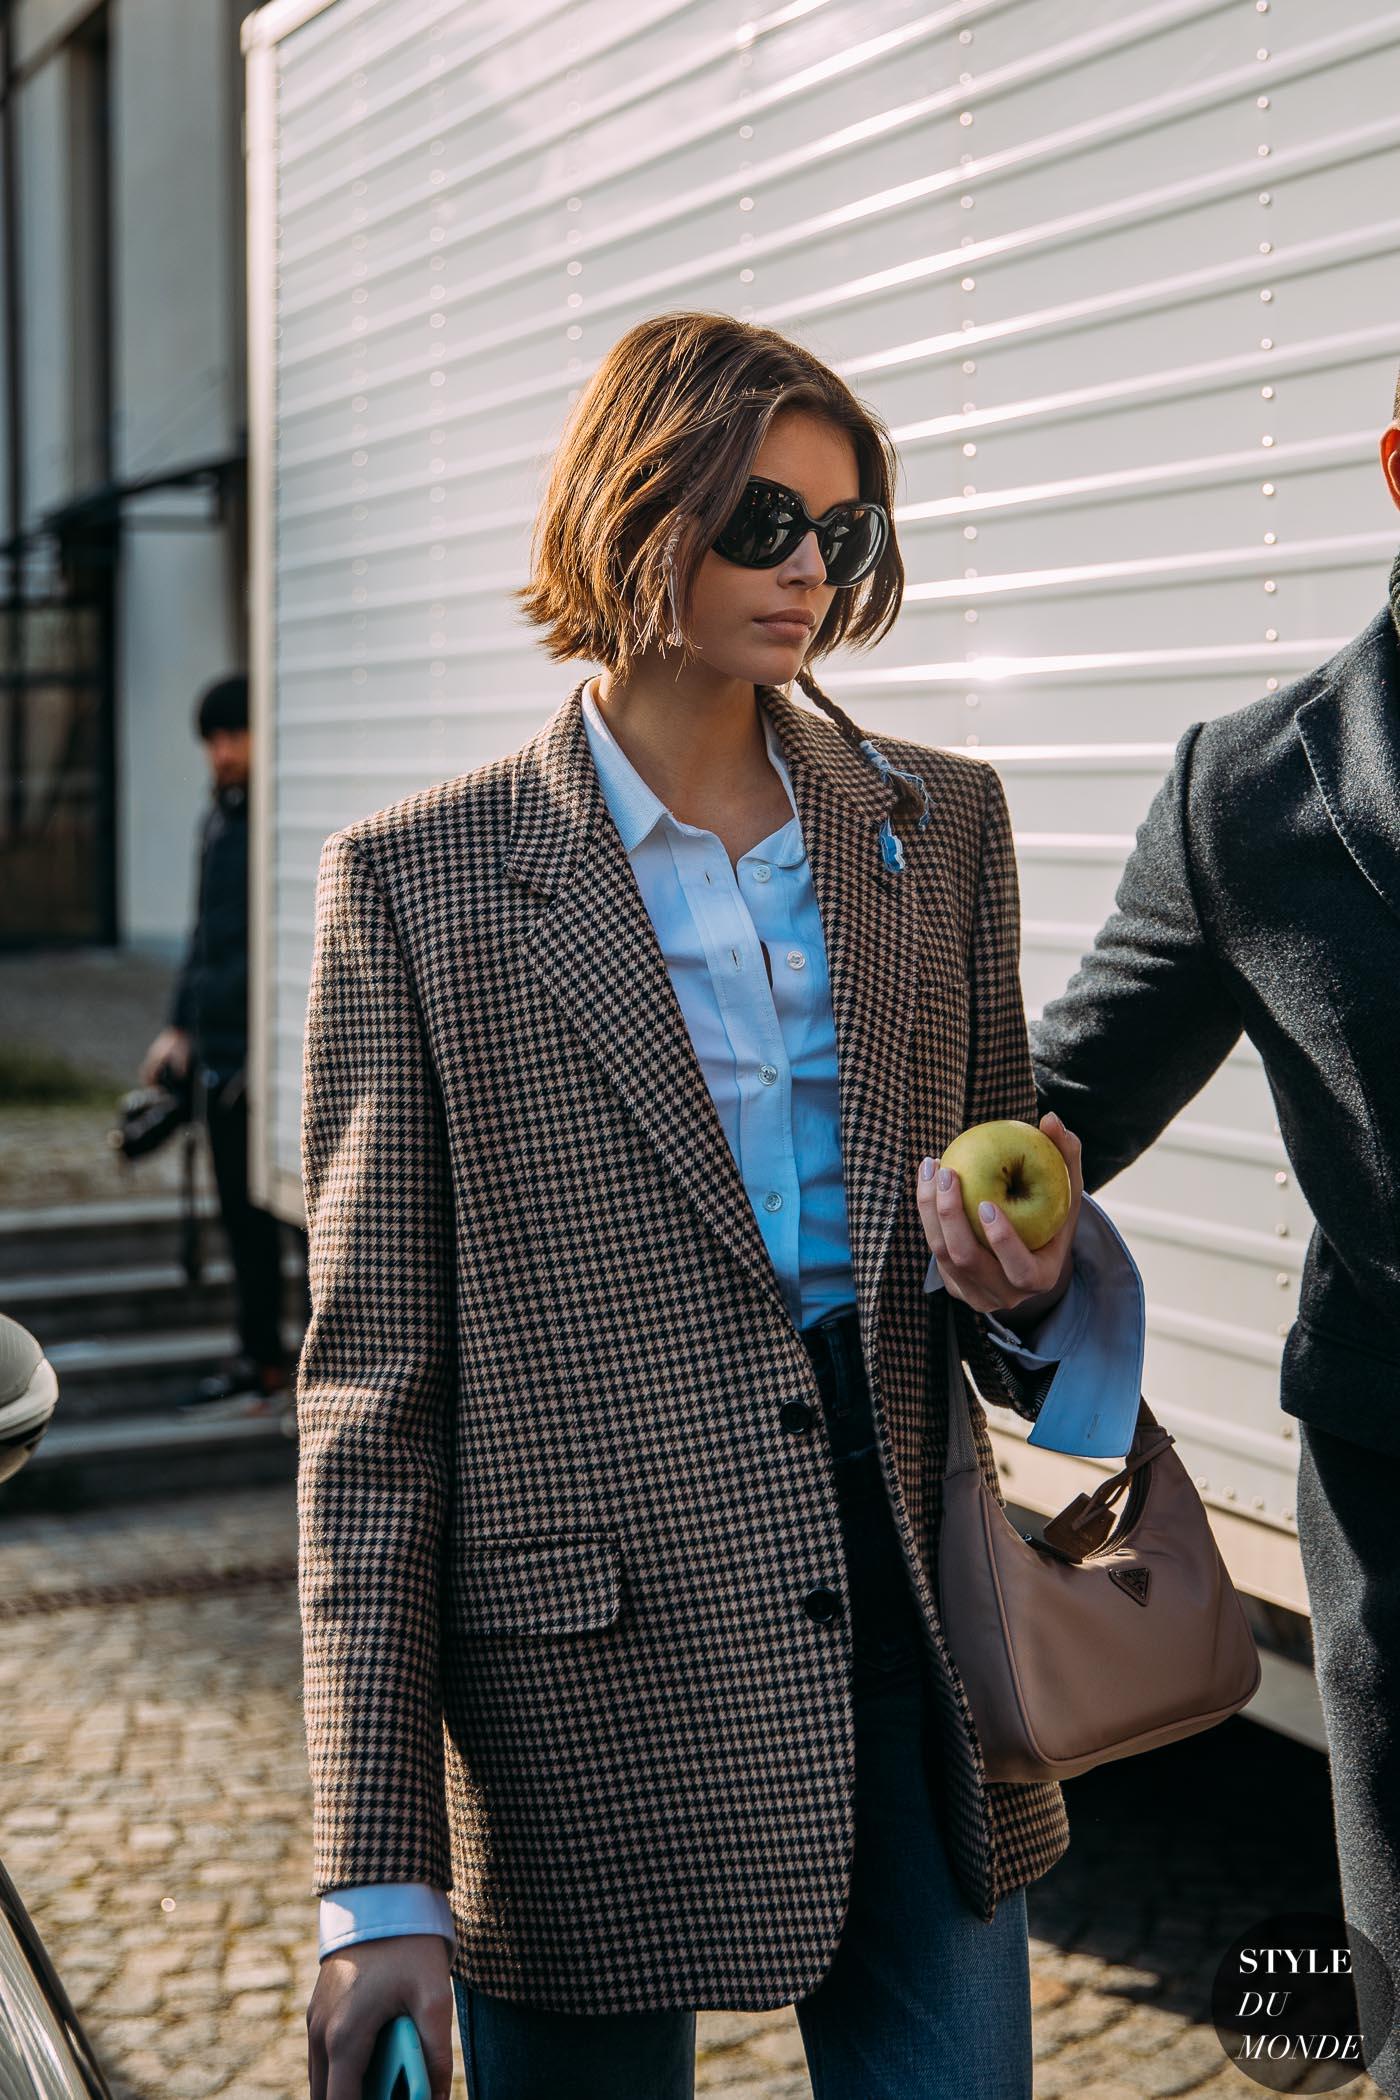 kaia gerber tuần lễ thời trang milan thu đông 2020 túi prada